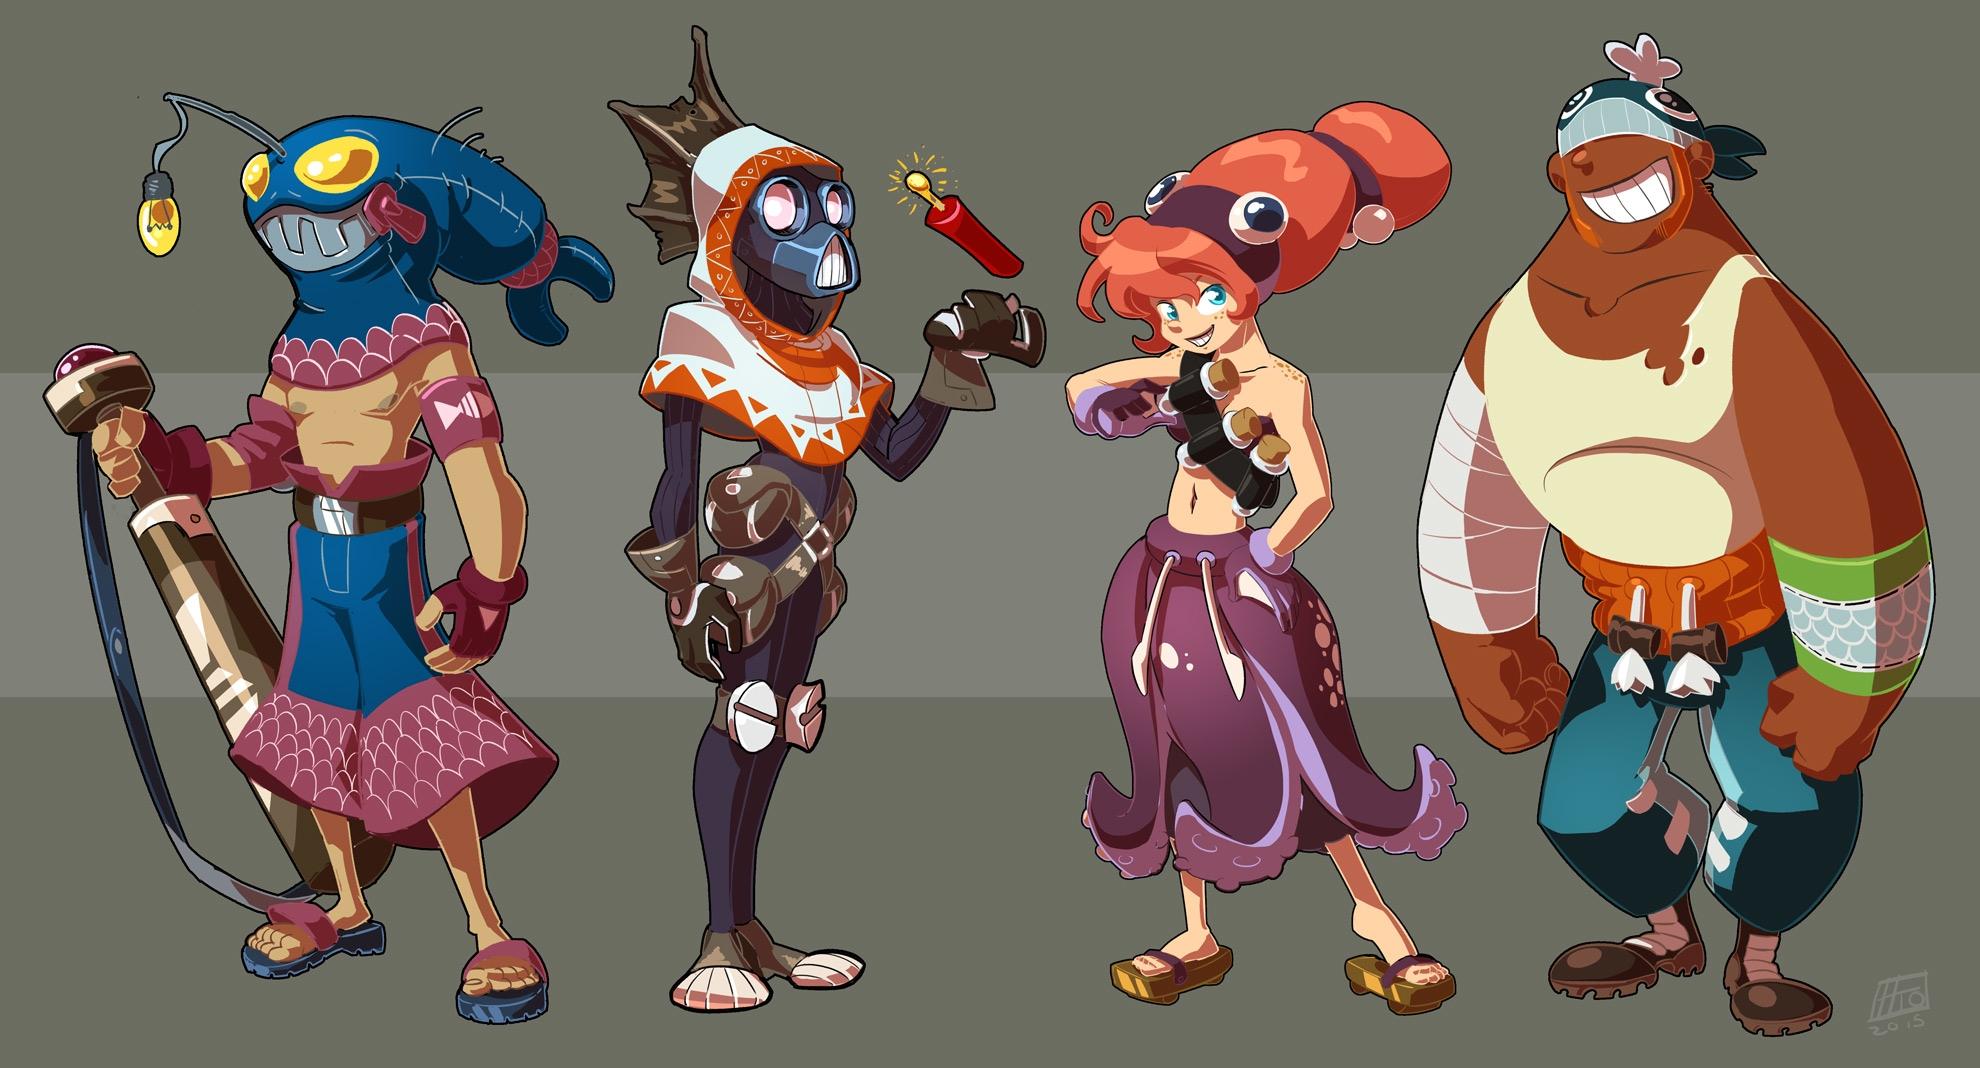 full team - characterdesign - emanuelearnaldi | ello